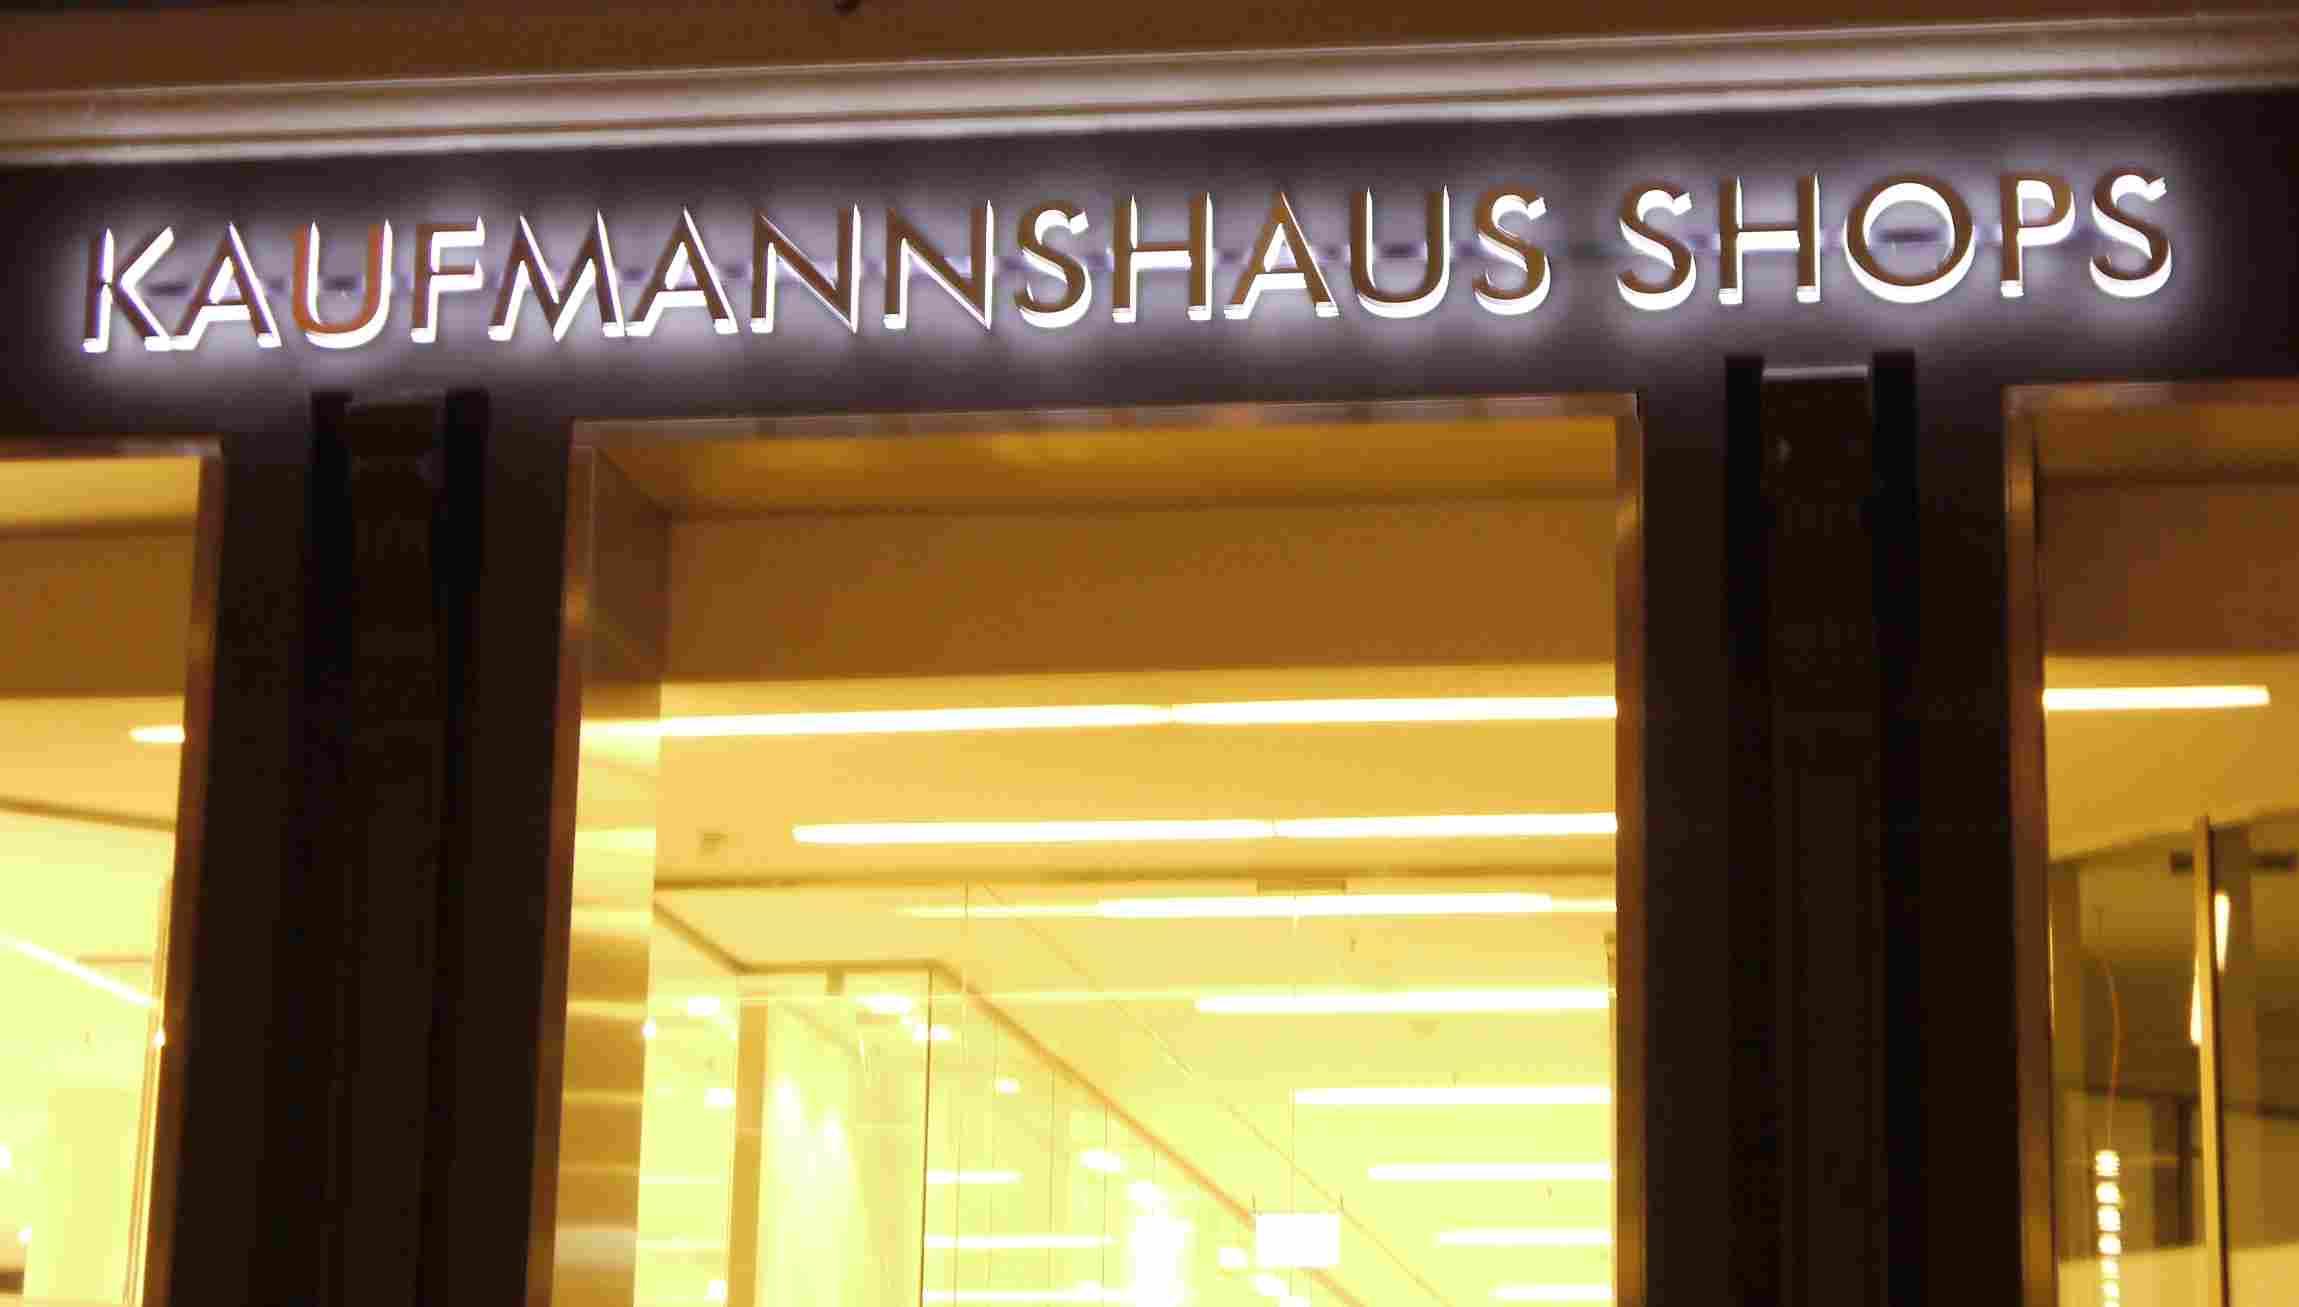 Kaufmannshaus Shops Foto: ganz-hamburg.de